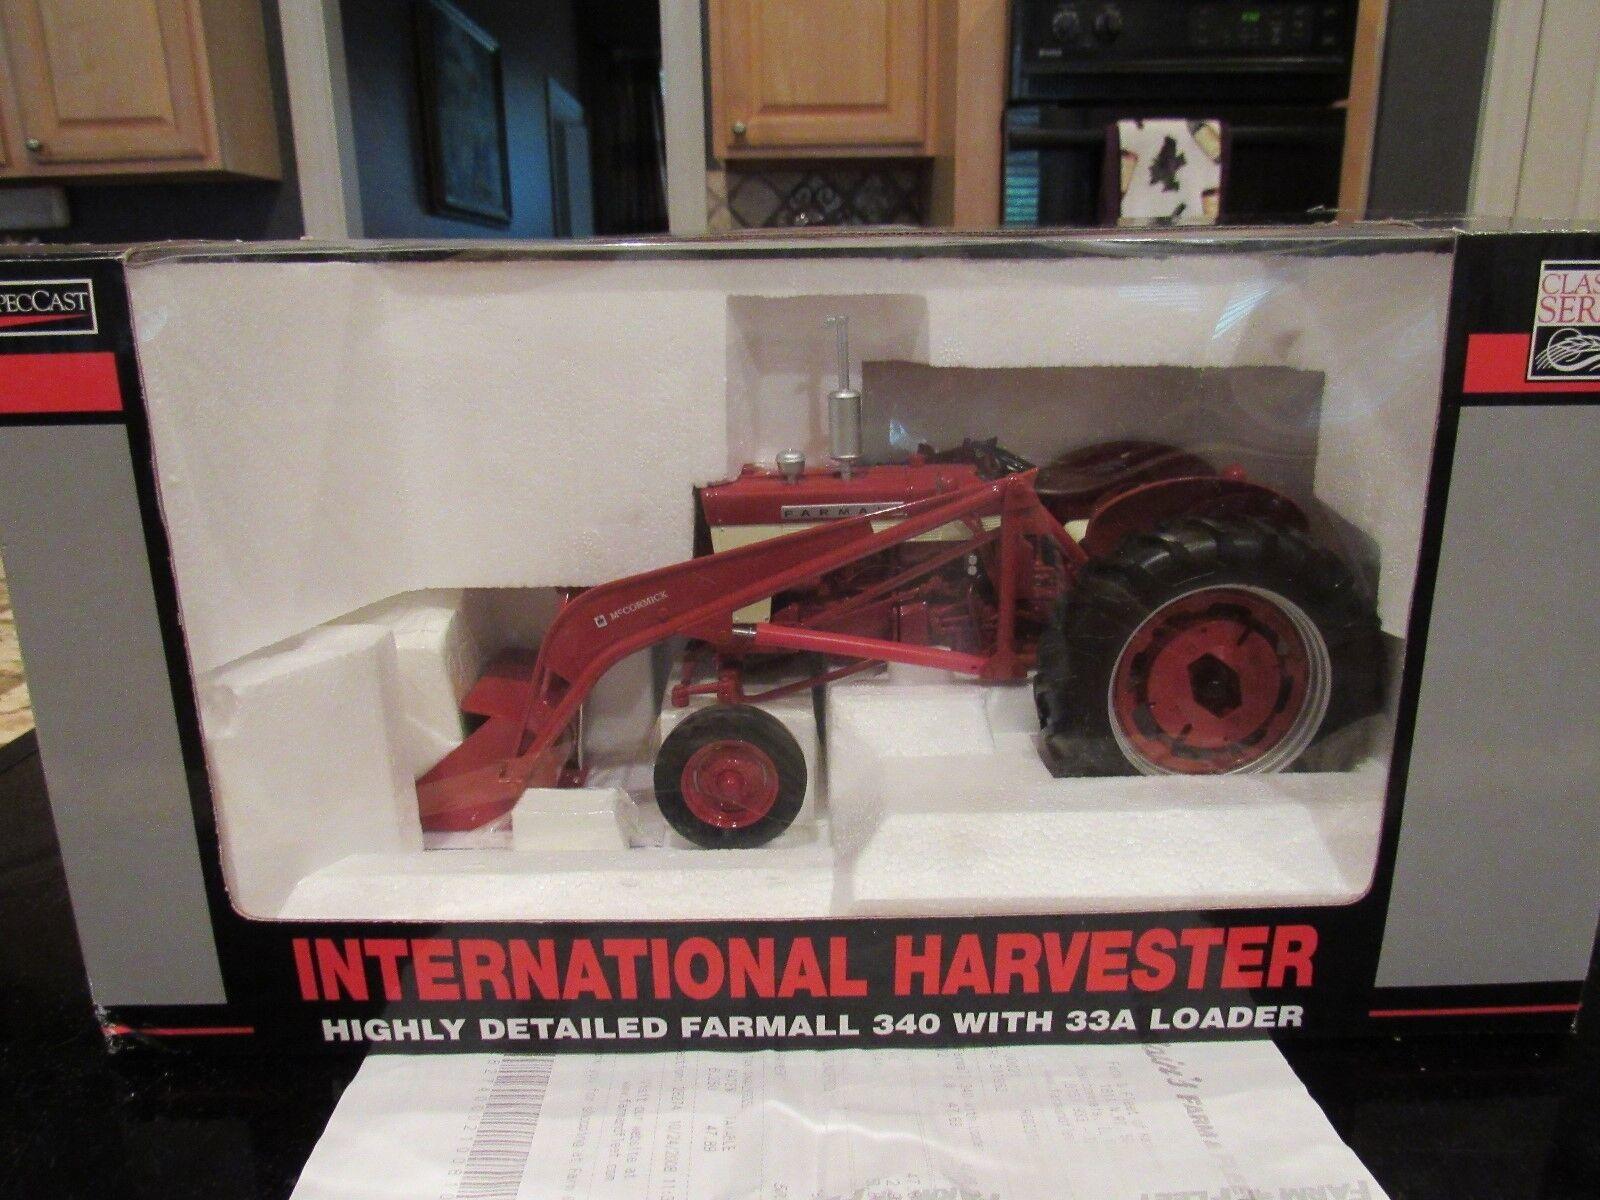 SPECCAST INTERNATIONAL HARVESTER FARMALL 340 WITH 33A LOADER NIB W RECEIPT 2008